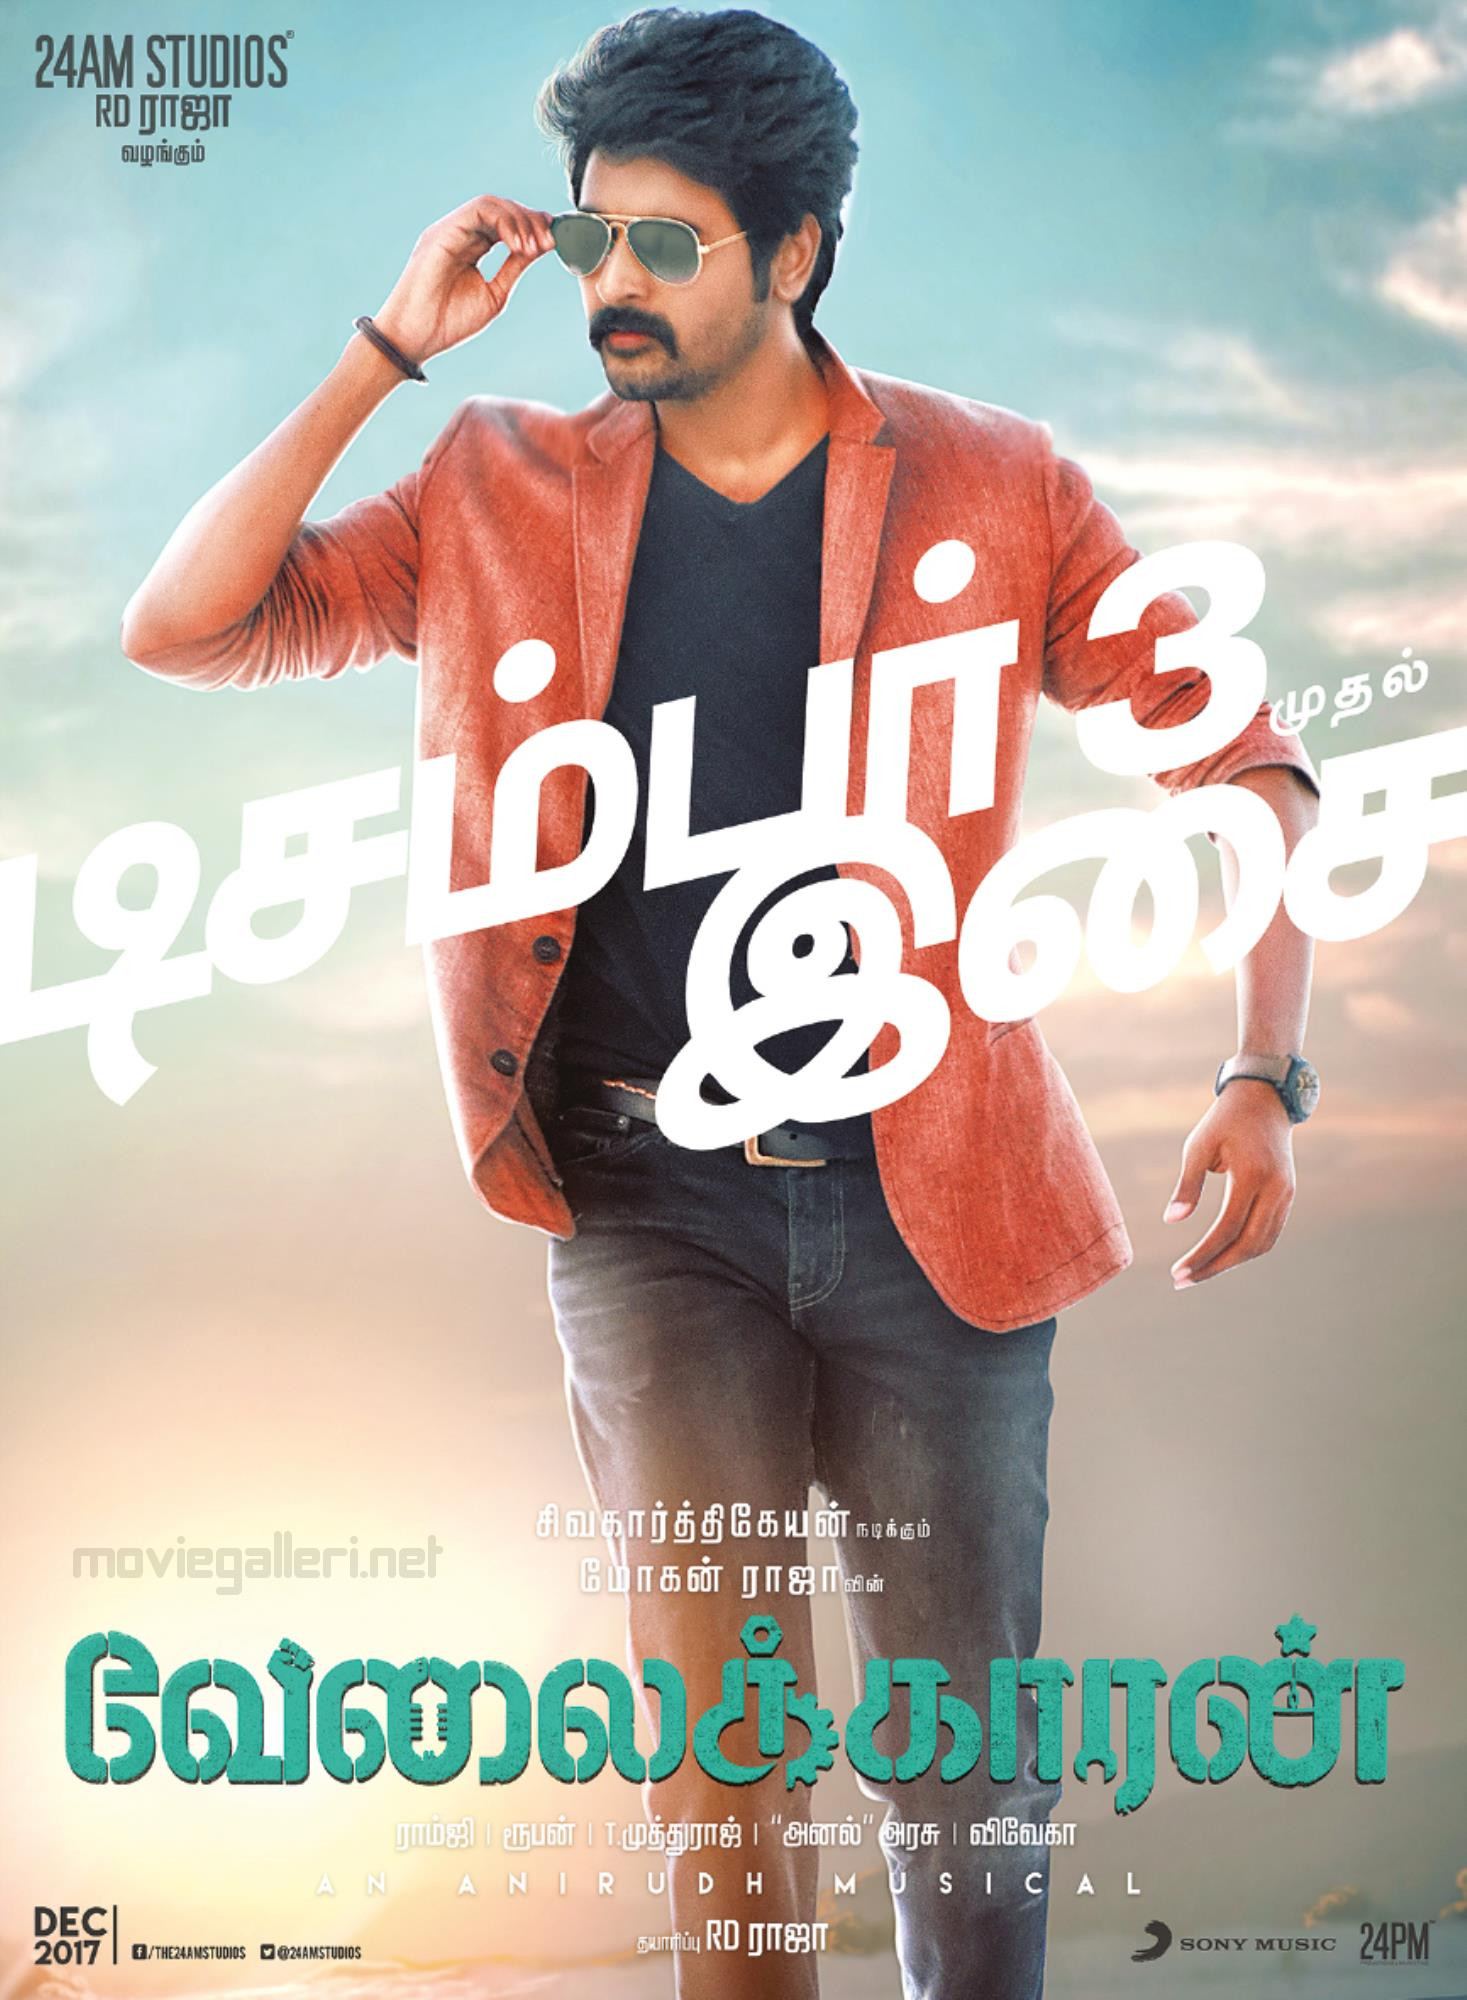 Actor SivaKarthikeyan Velaikaran Audio Songs from 3rd December Poster